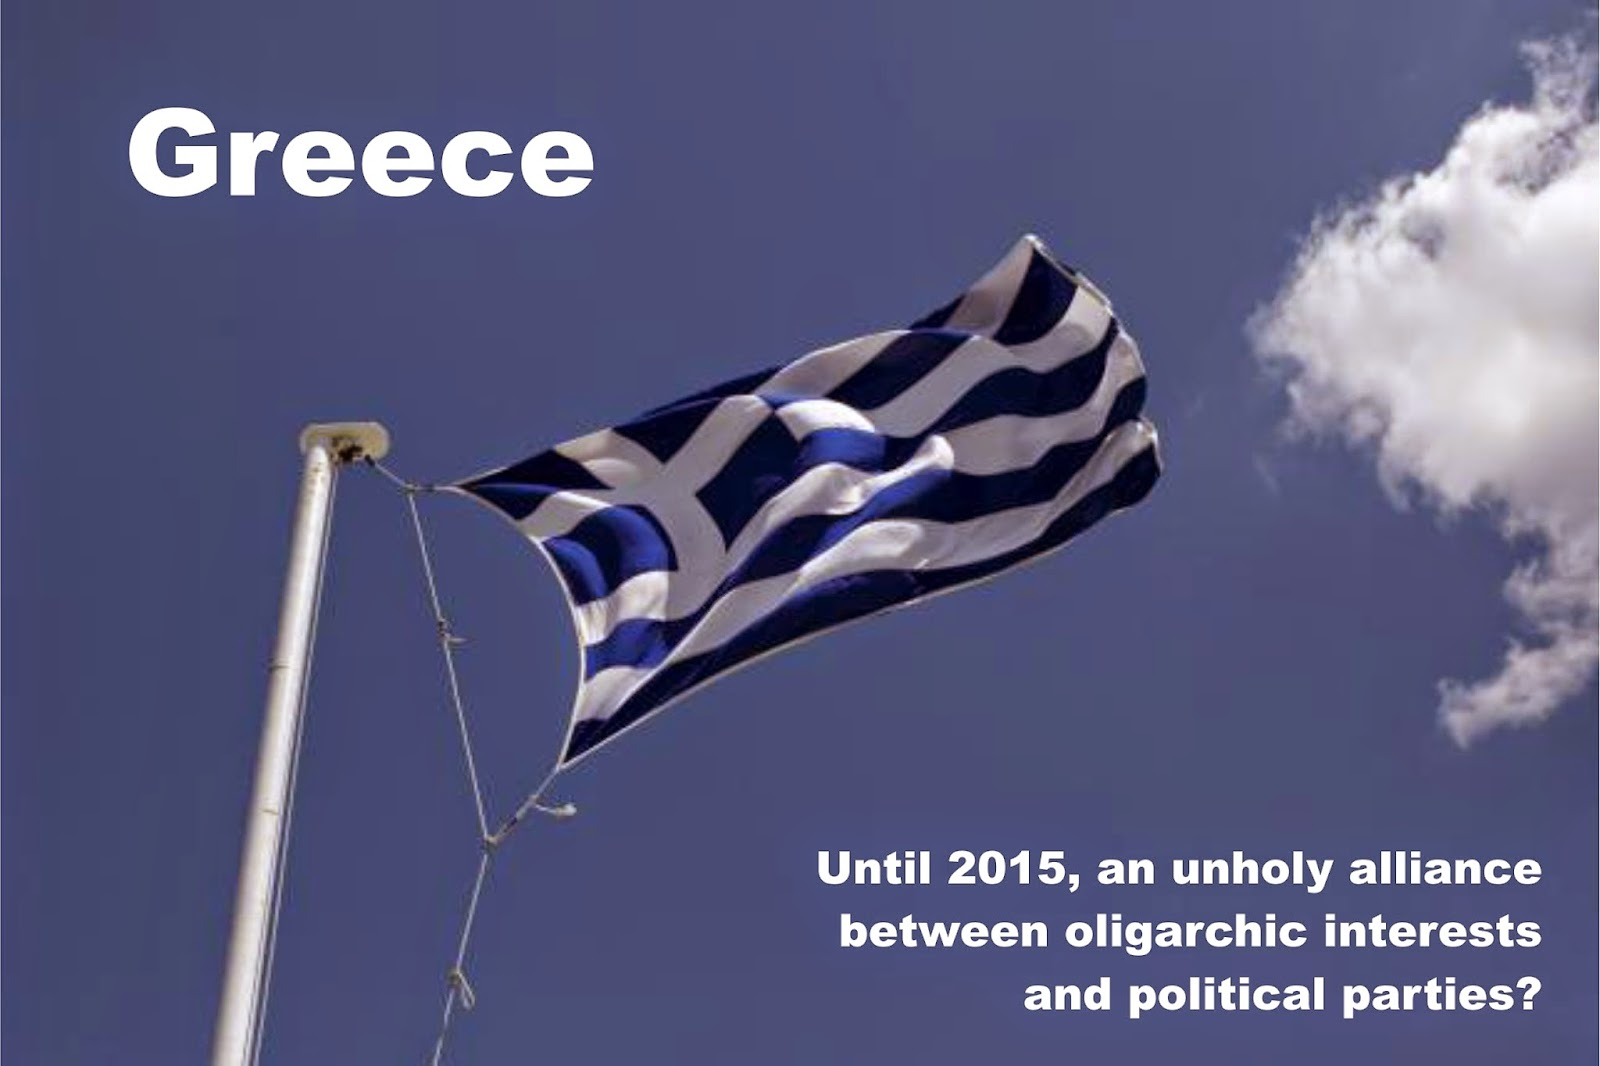 http://1.bp.blogspot.com/-ysClcZK4Us8/VUty3HuDH-I/AAAAAAAAHUs/4U_H8lj02Jc/s1600/Greece%2B%26%2BEurope.%2BYanis%2BVaroufakis%2C%2BAlexis%2BTsipras%2Band%2BAngela%2BMerkel.%2B%231ab.jpg?SSImageQuality=Full